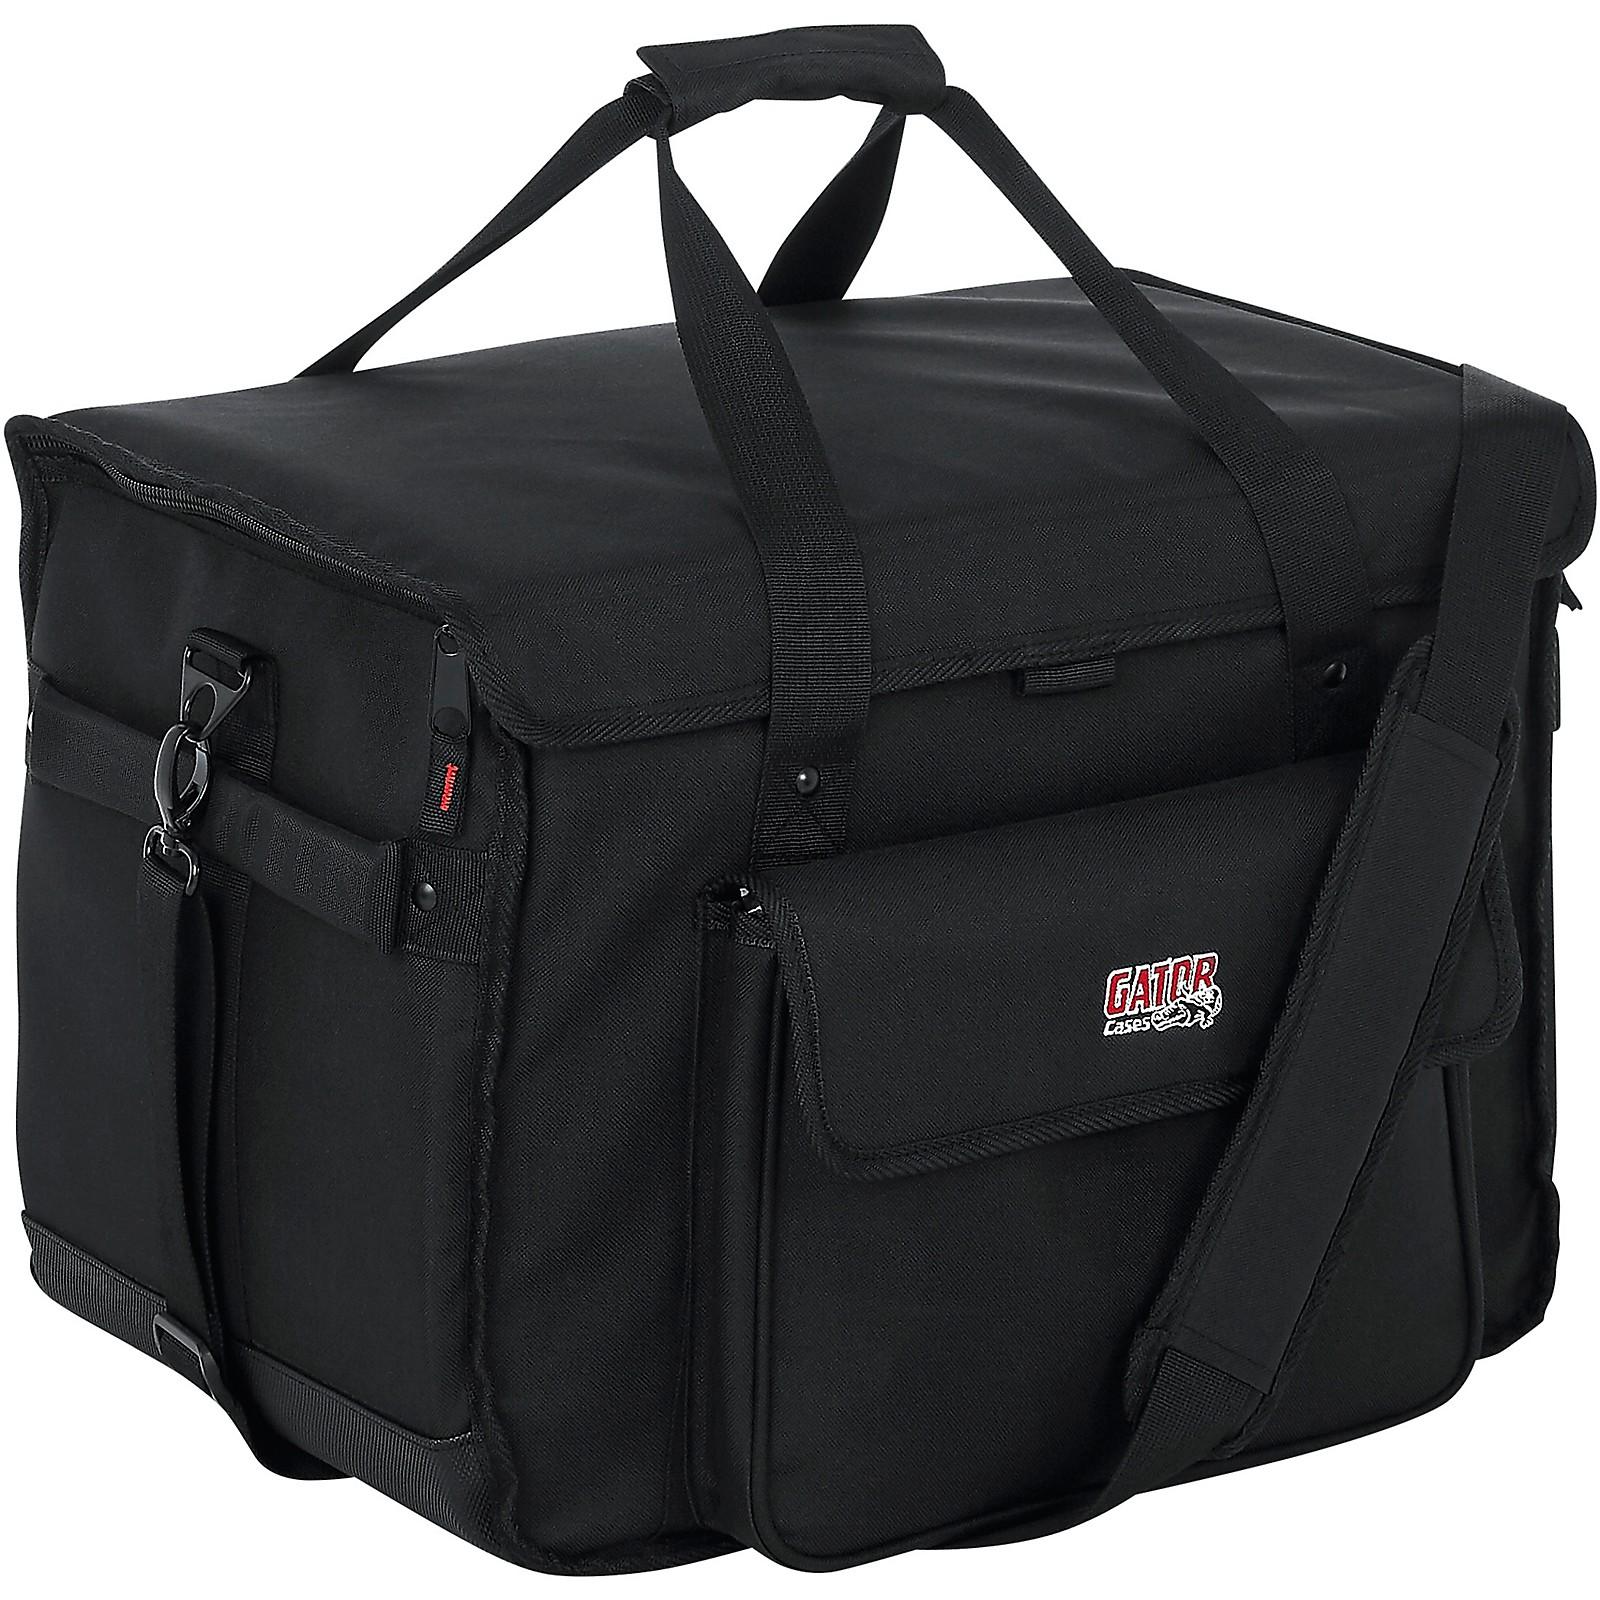 Gator Studio Monitor Tote Bag (G-STUDIOMON1)